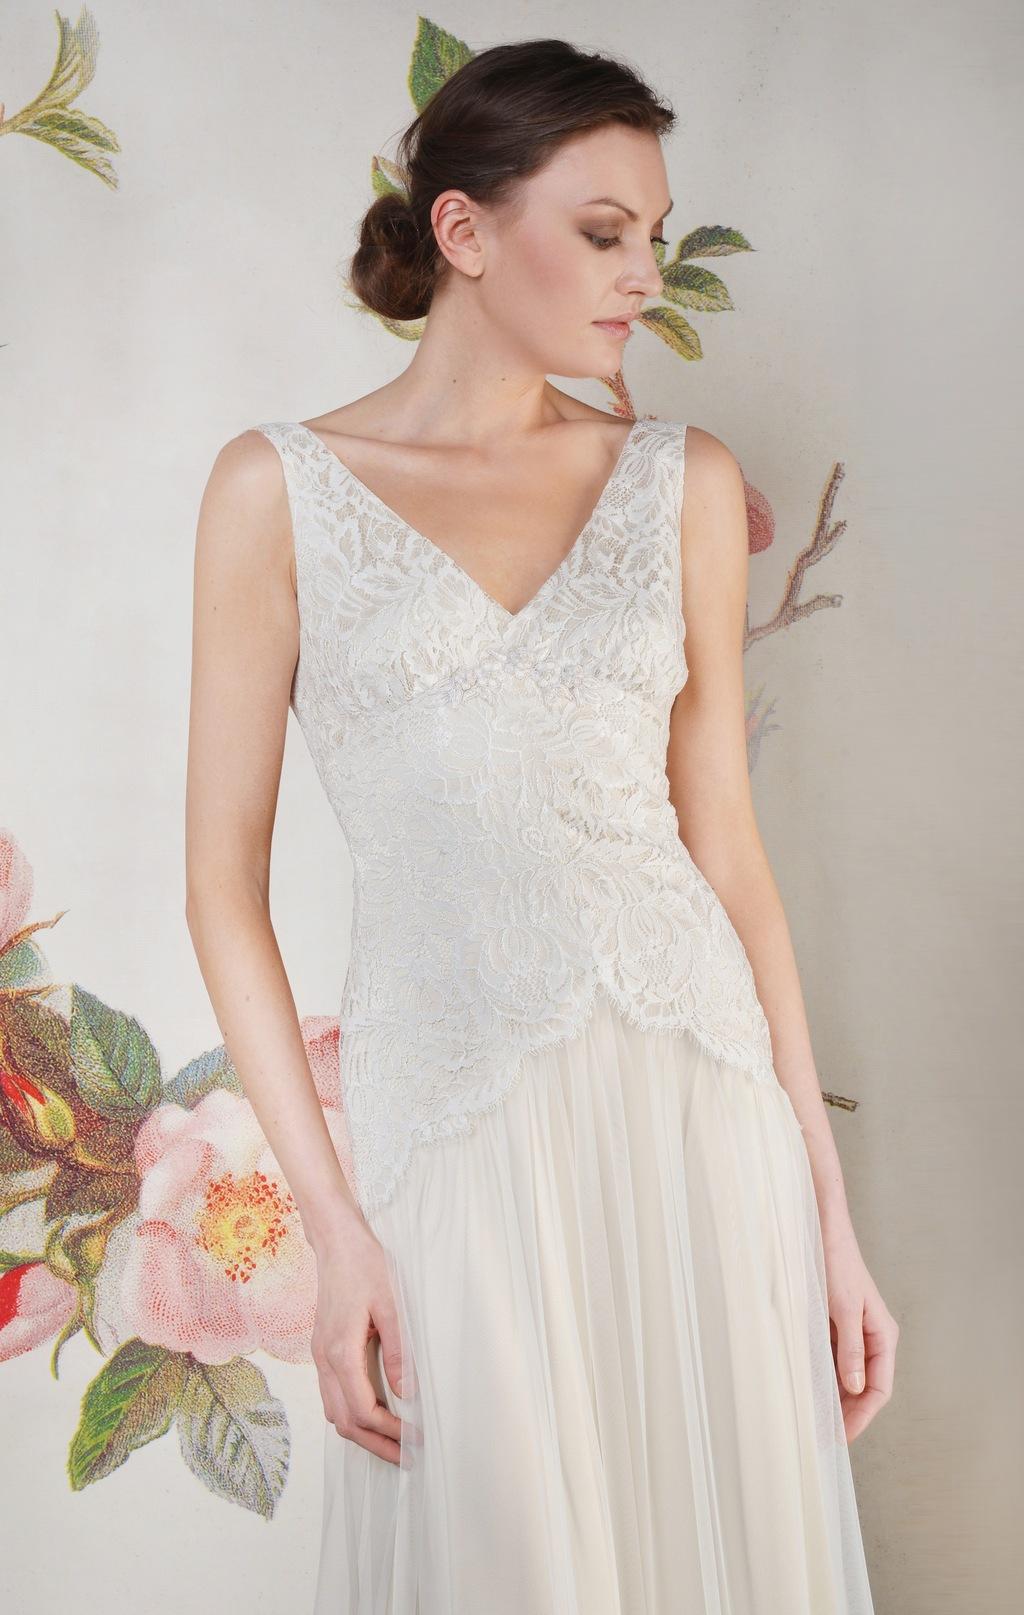 Claire-pettibone-spring-summer-2014-wedding-dress-florentine_f_03.full